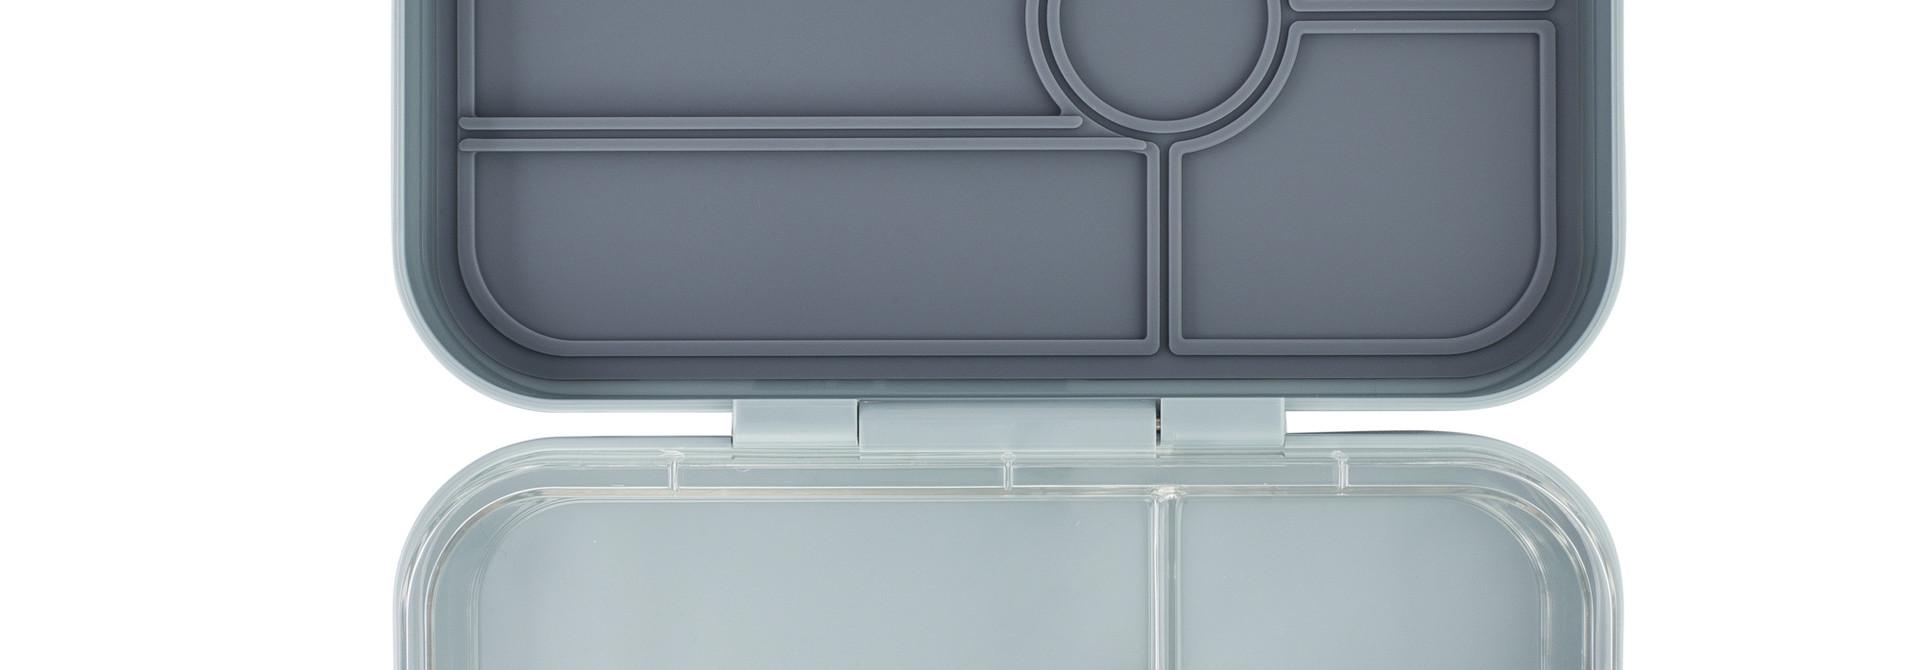 Yumbox Tapas XL lunchtrommel Flat Iron grijs / transparante tray 4 vakken